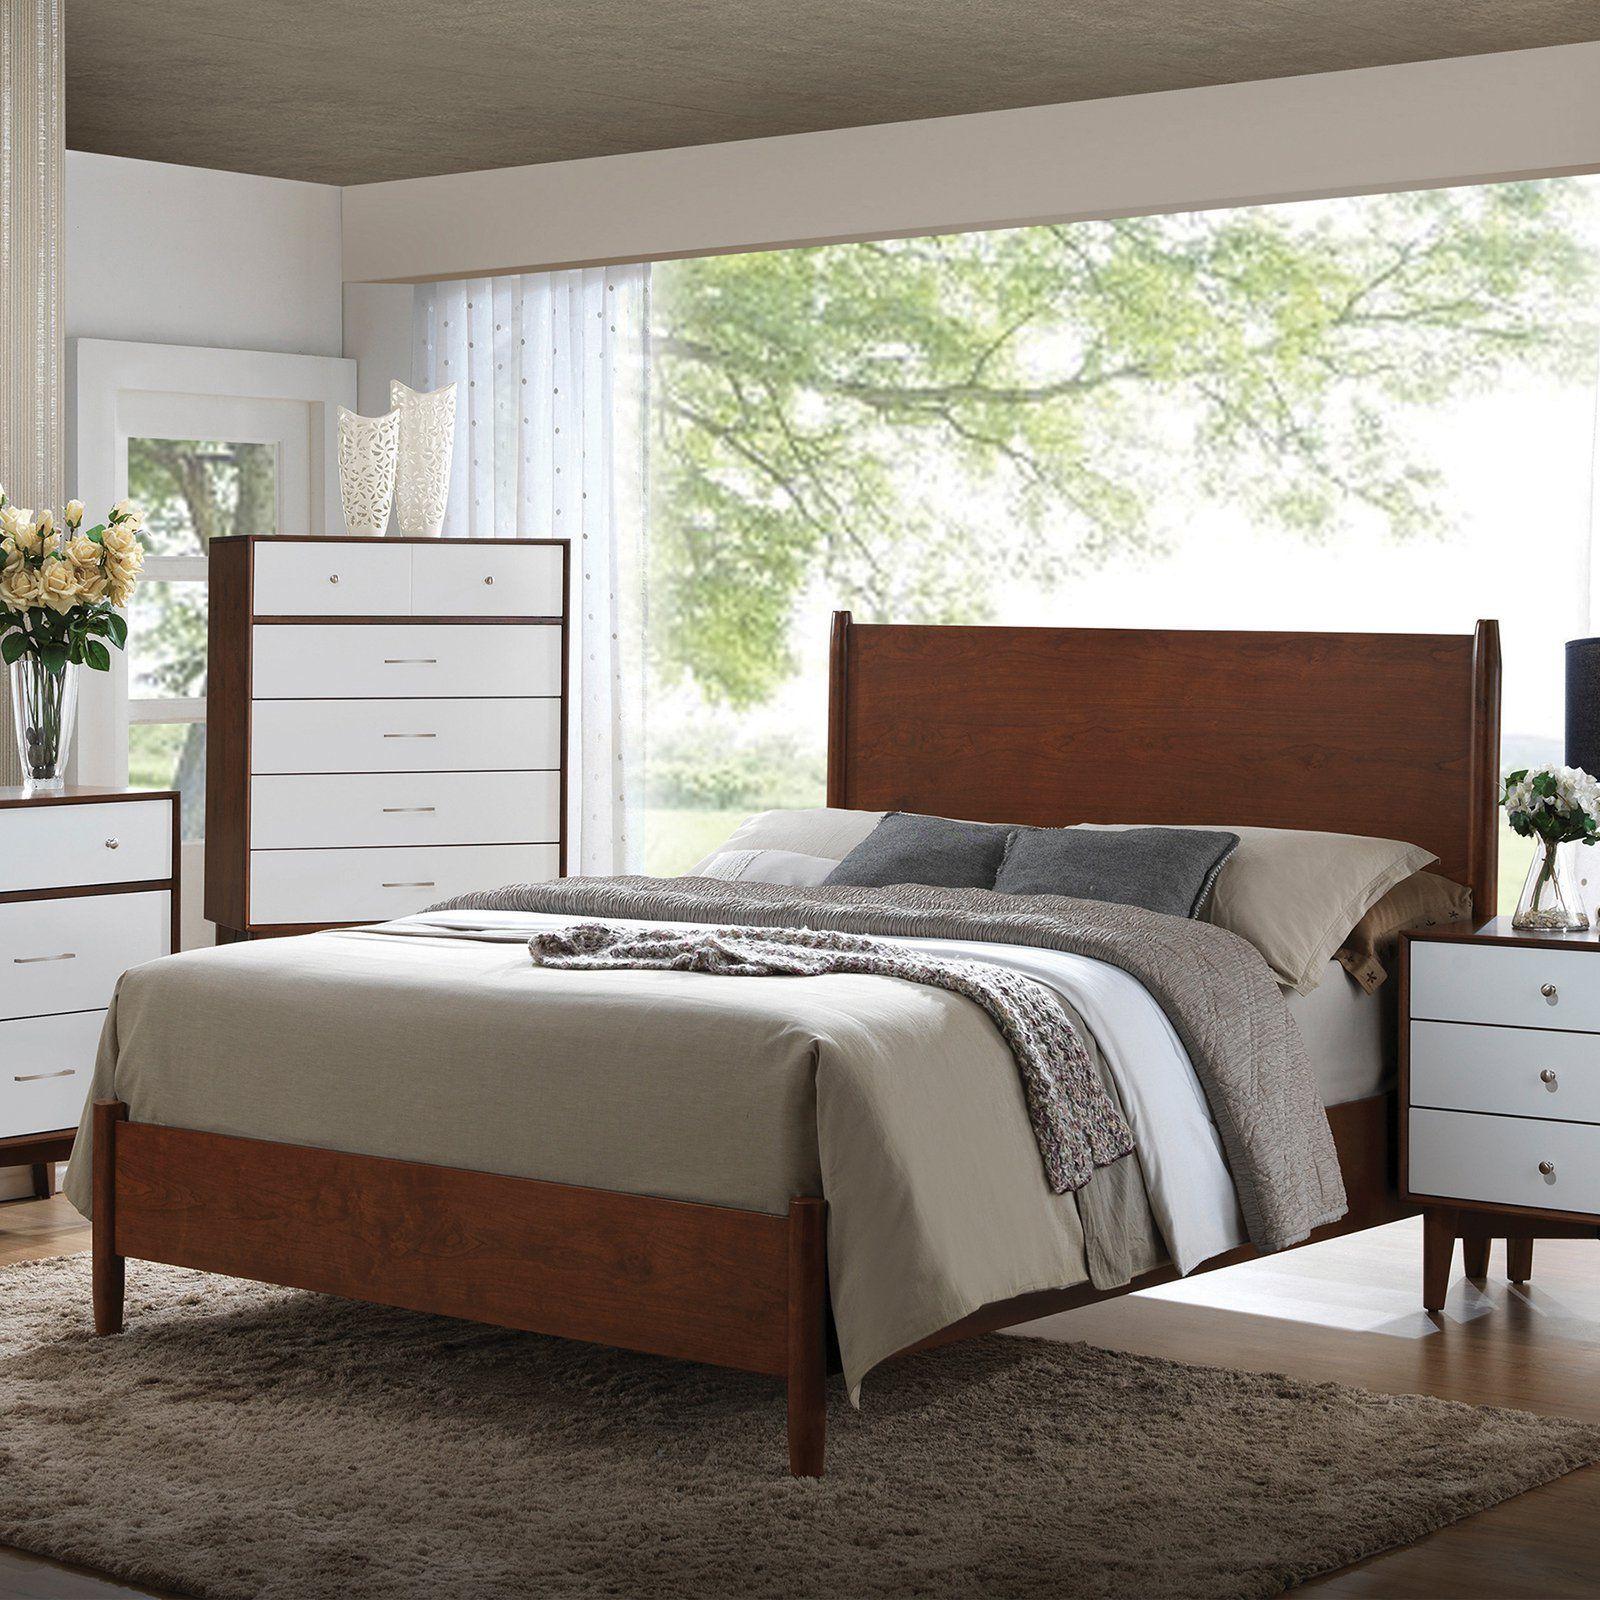 Coaster Furniture Oakwood Panel Bed Hayneedle 456